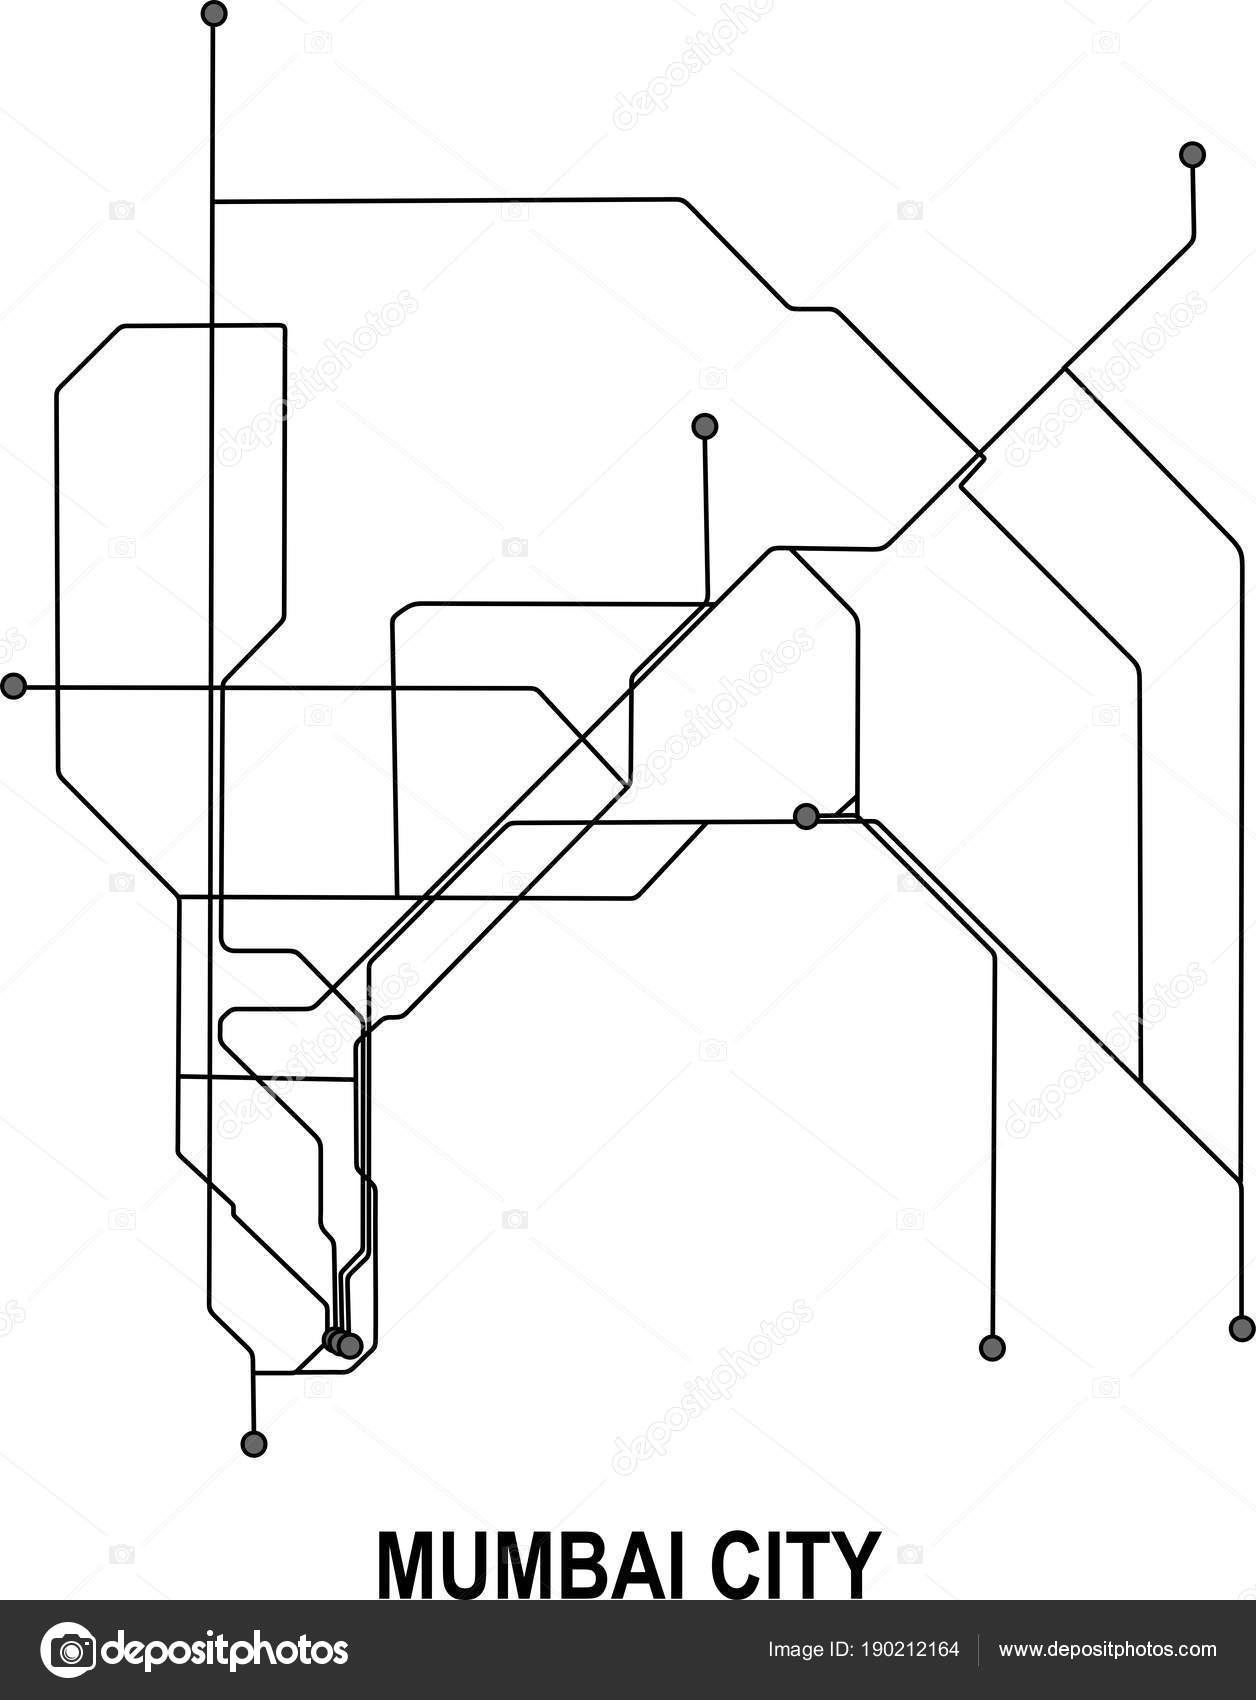 Mumbai Subway Map.Mumbai Subway Vector Map File Stock Vector C Fishvector 190212164